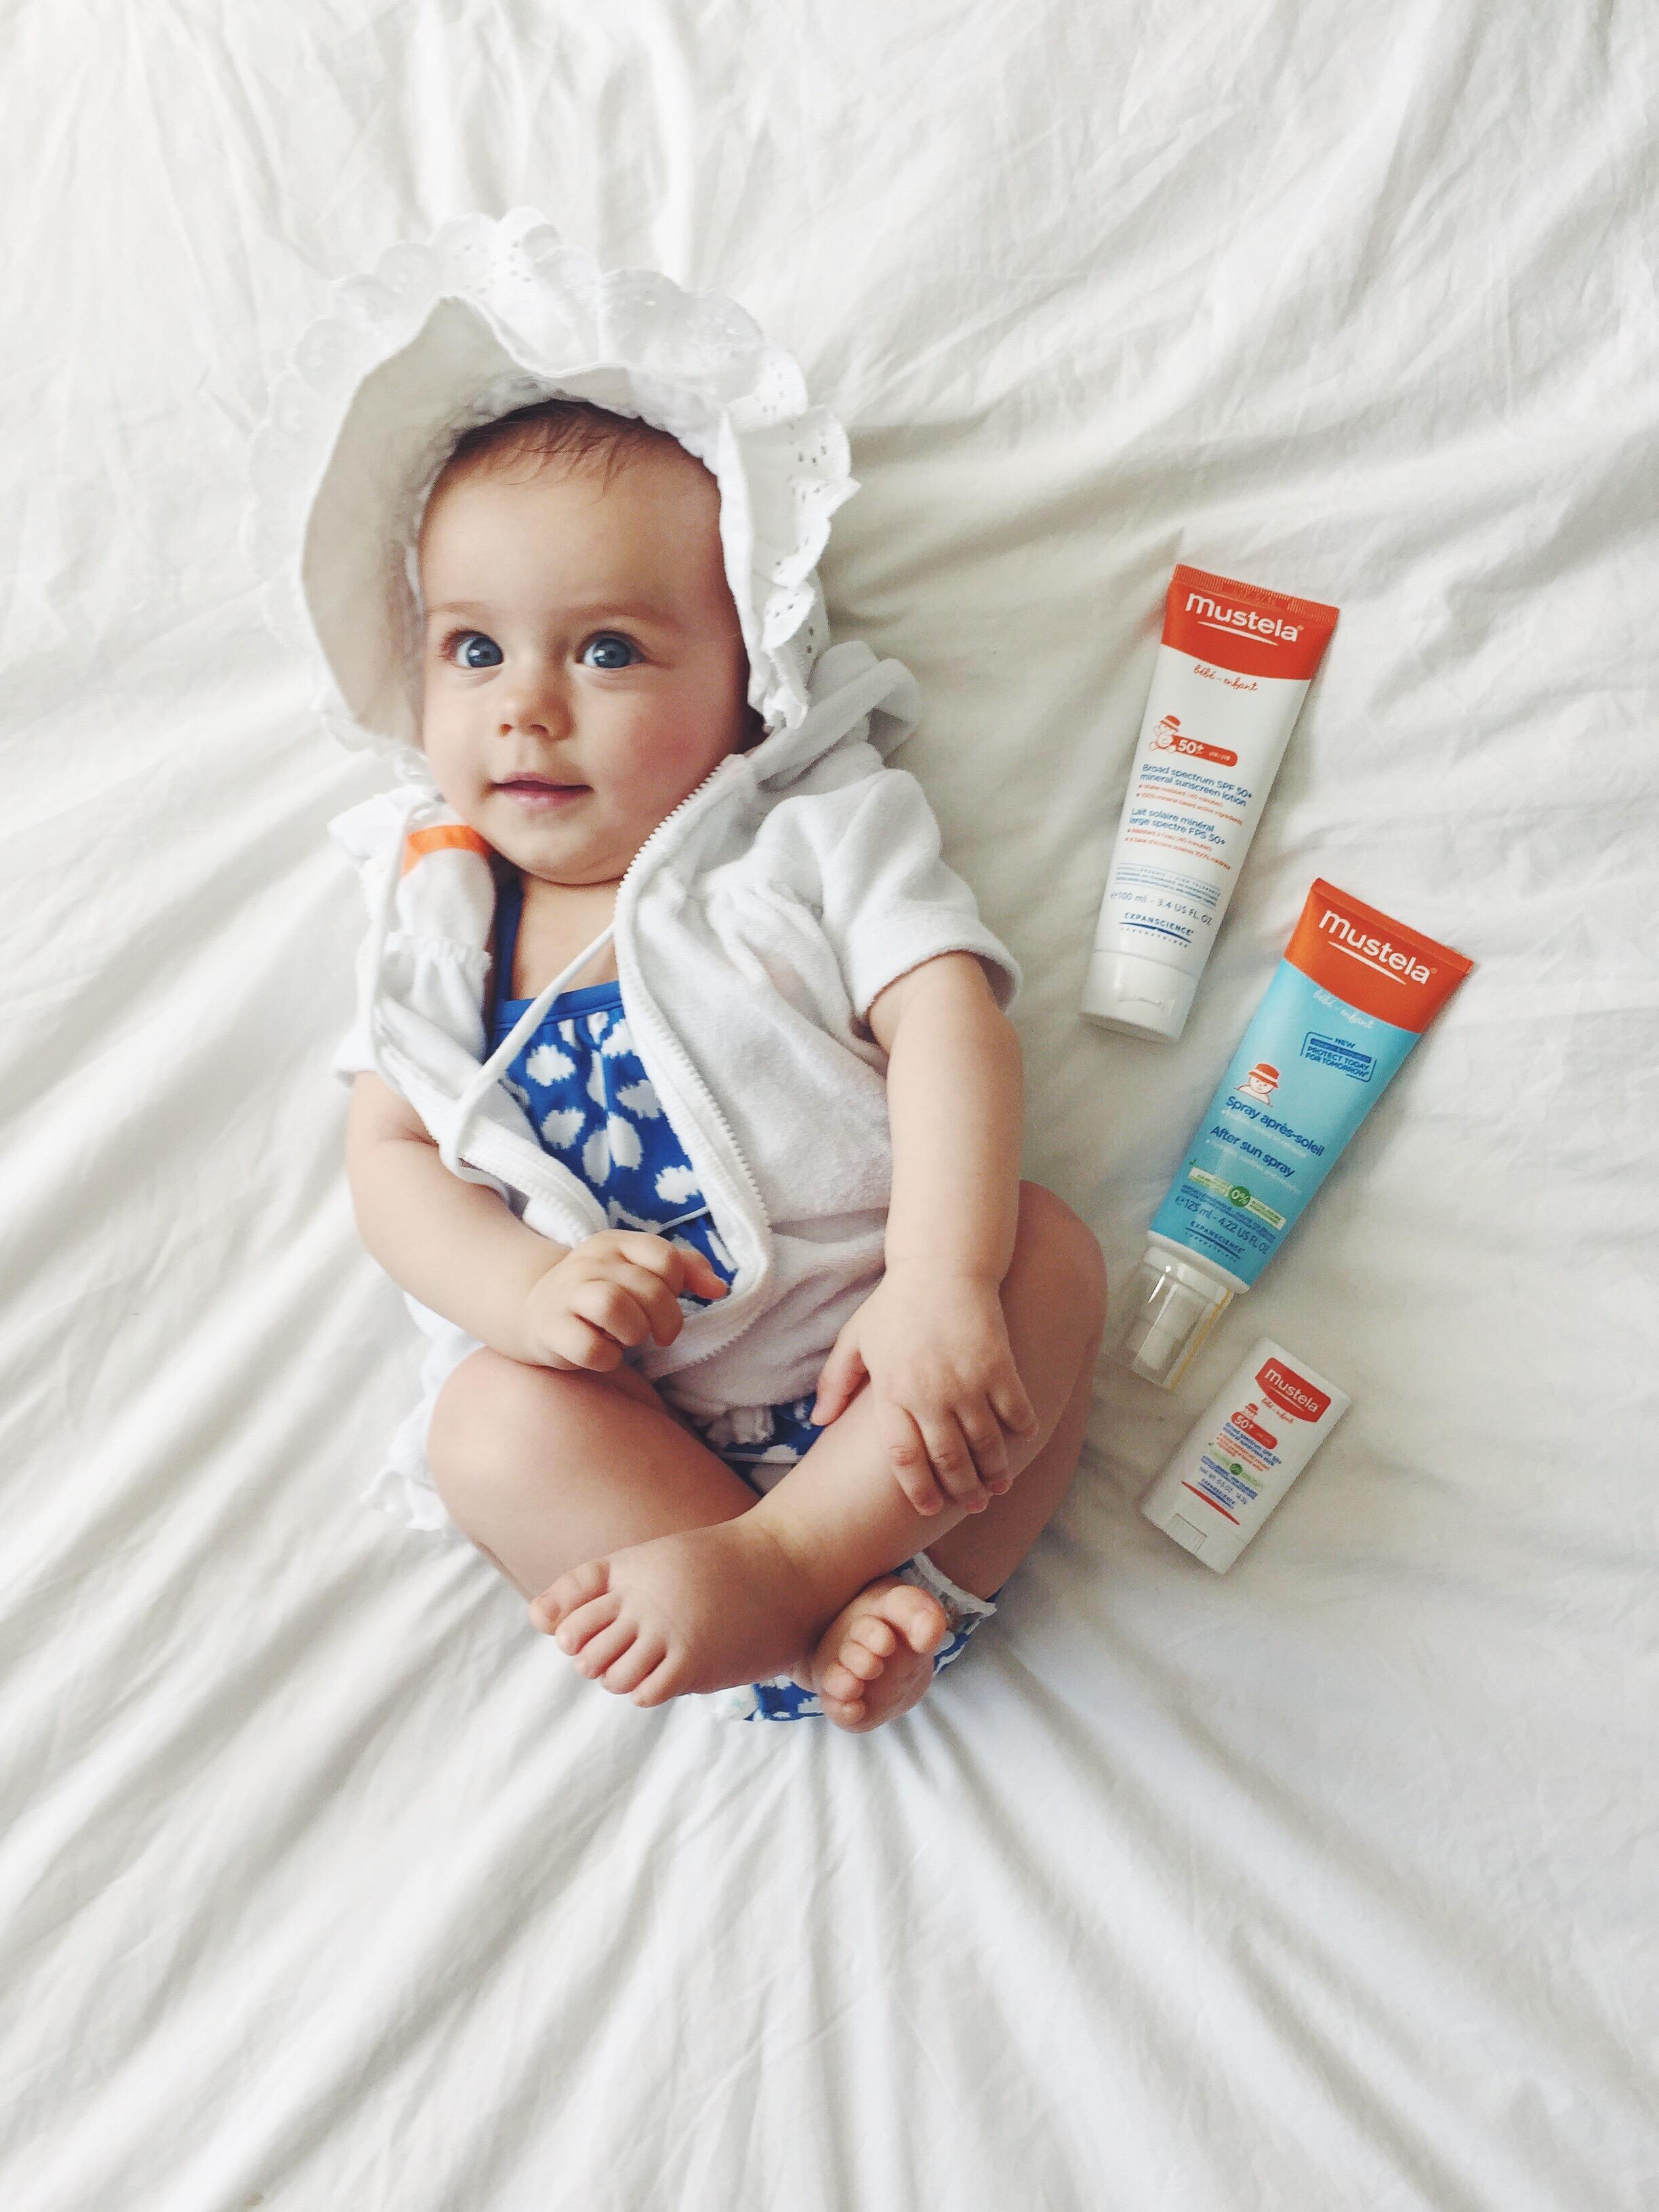 Mustela Baby Sunscreen & Suncare Tips